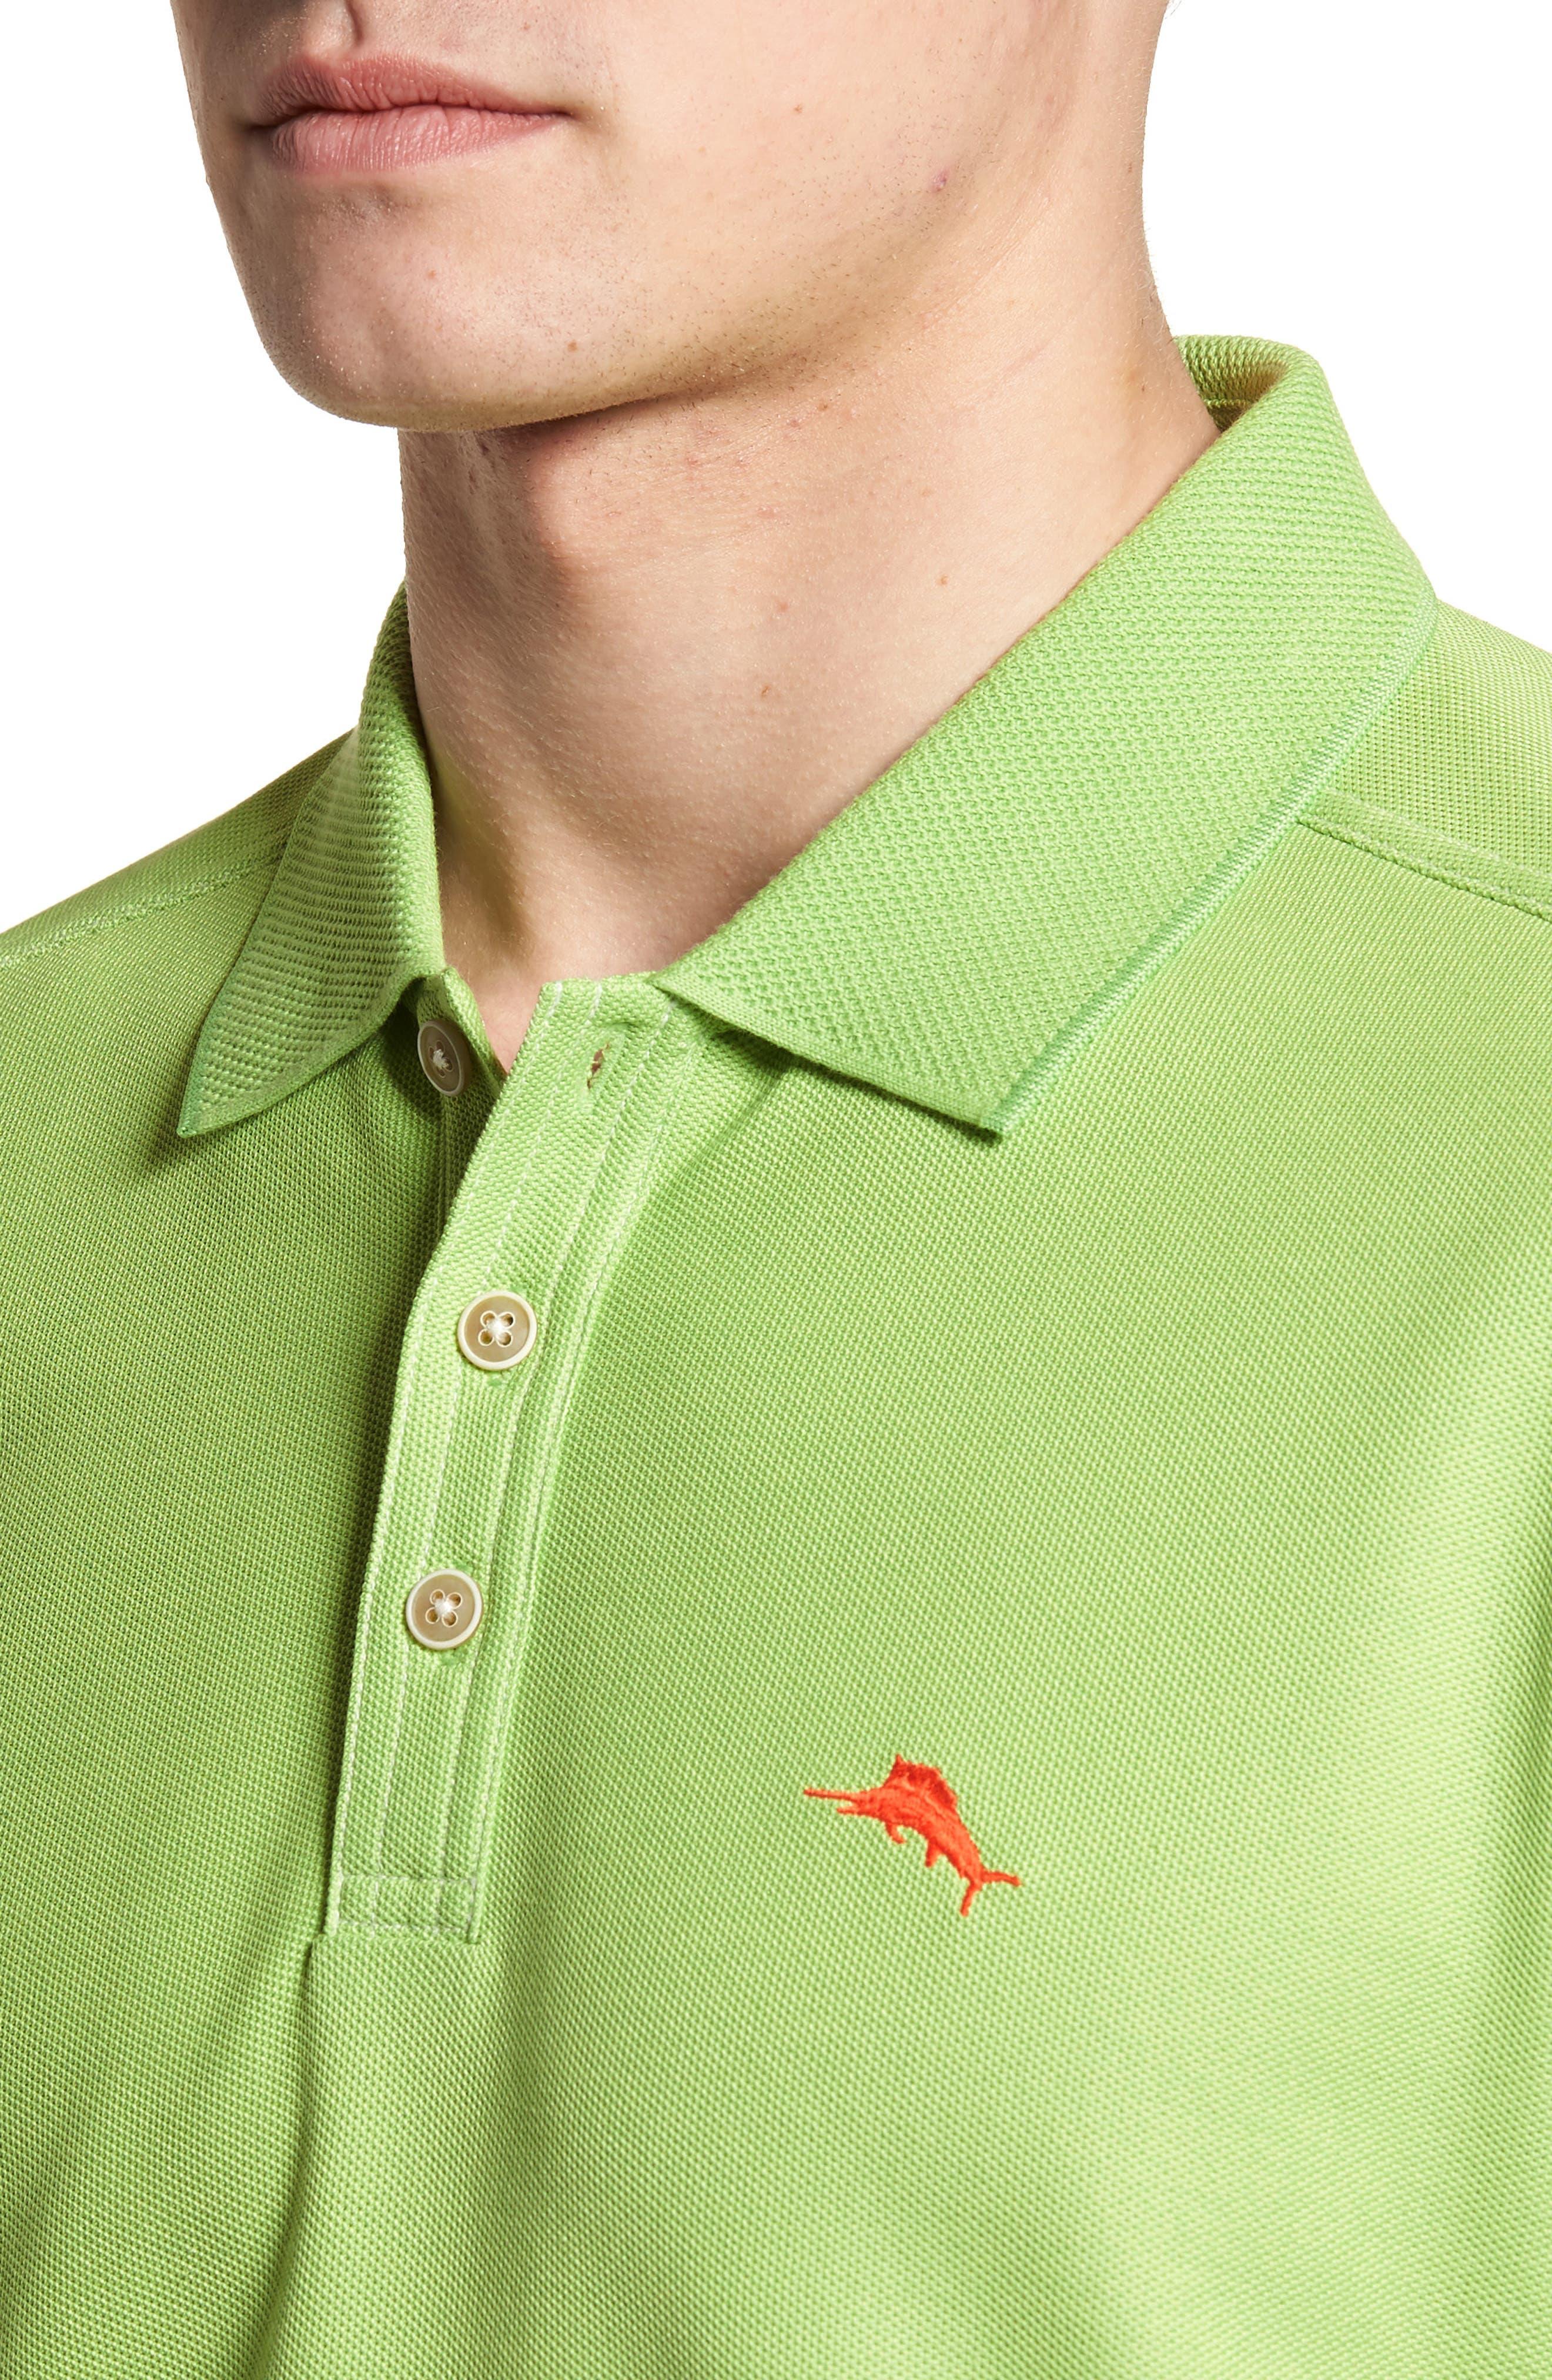 'The Emfielder' Original Fit Piqué Polo,                             Alternate thumbnail 3, color,                             Caicos Green